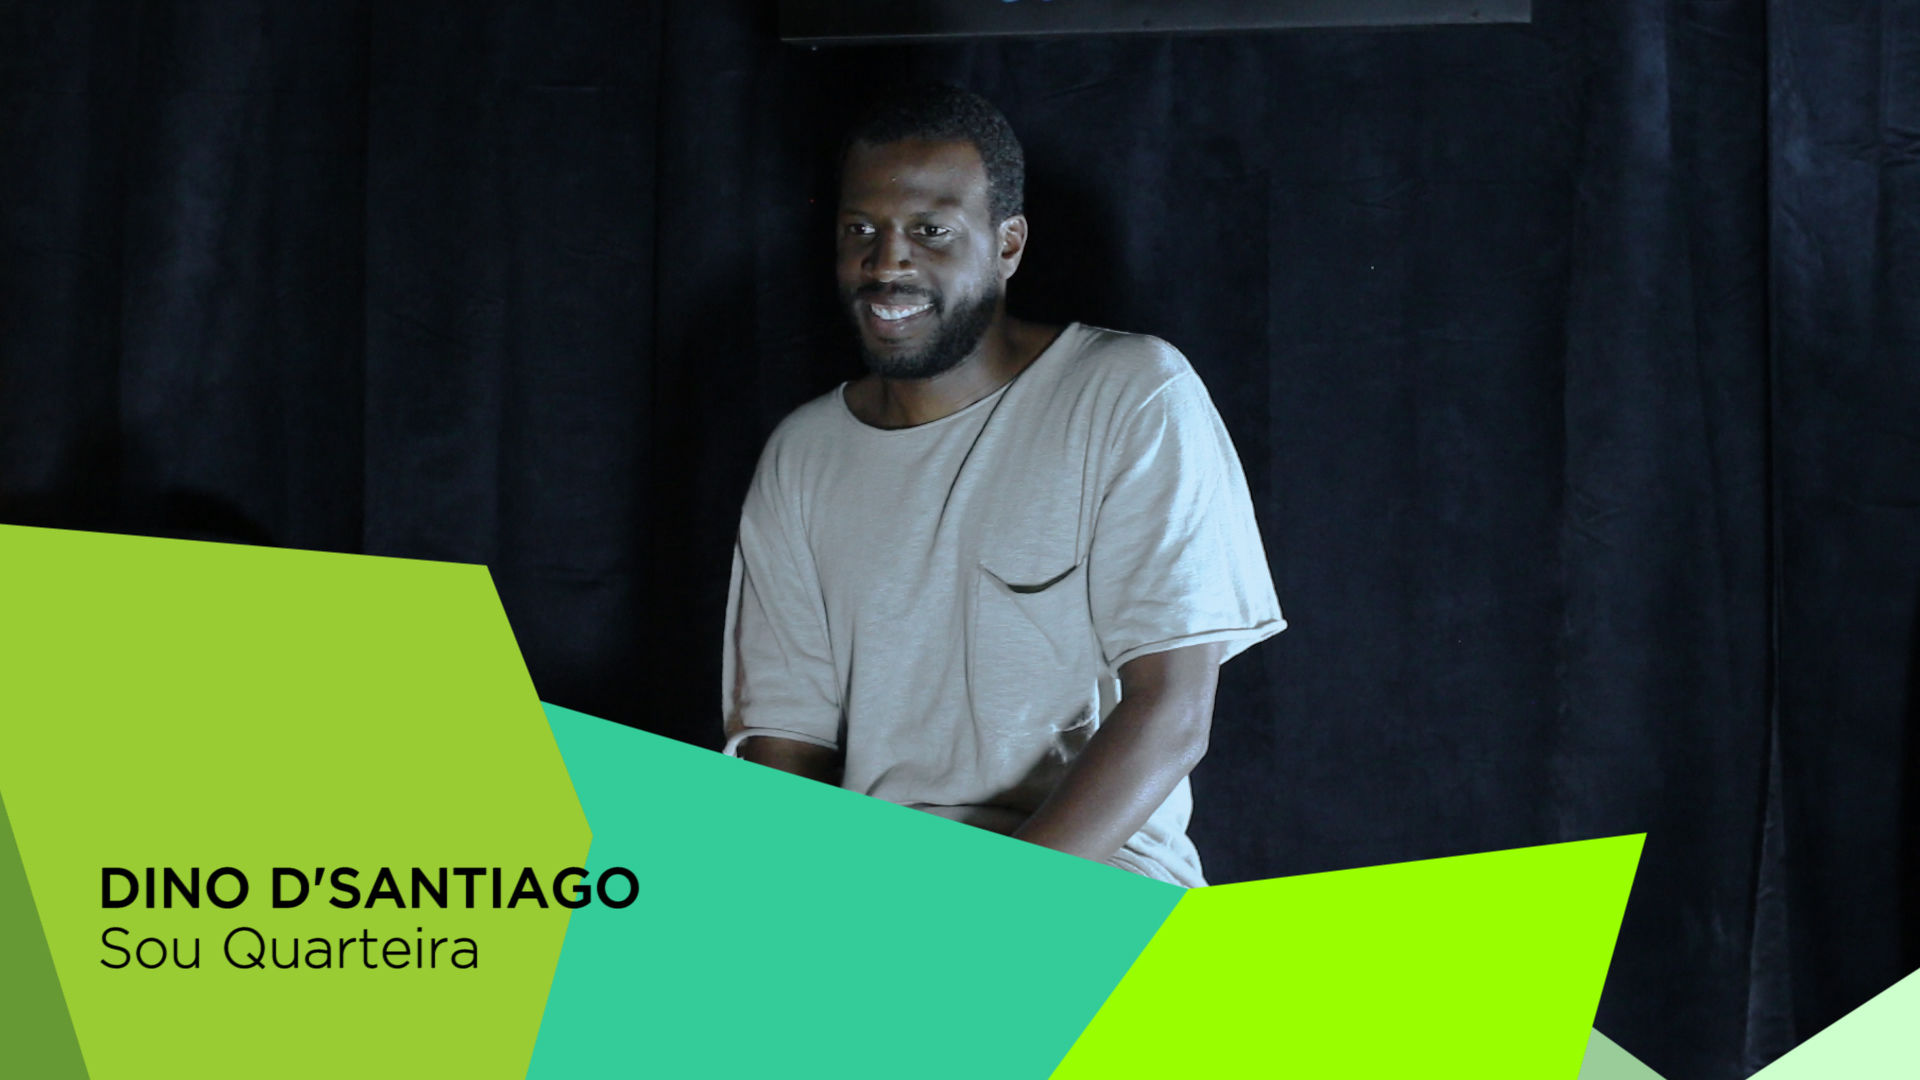 #KimaheraSections - Dino D'Santiago - Junho'17 #11